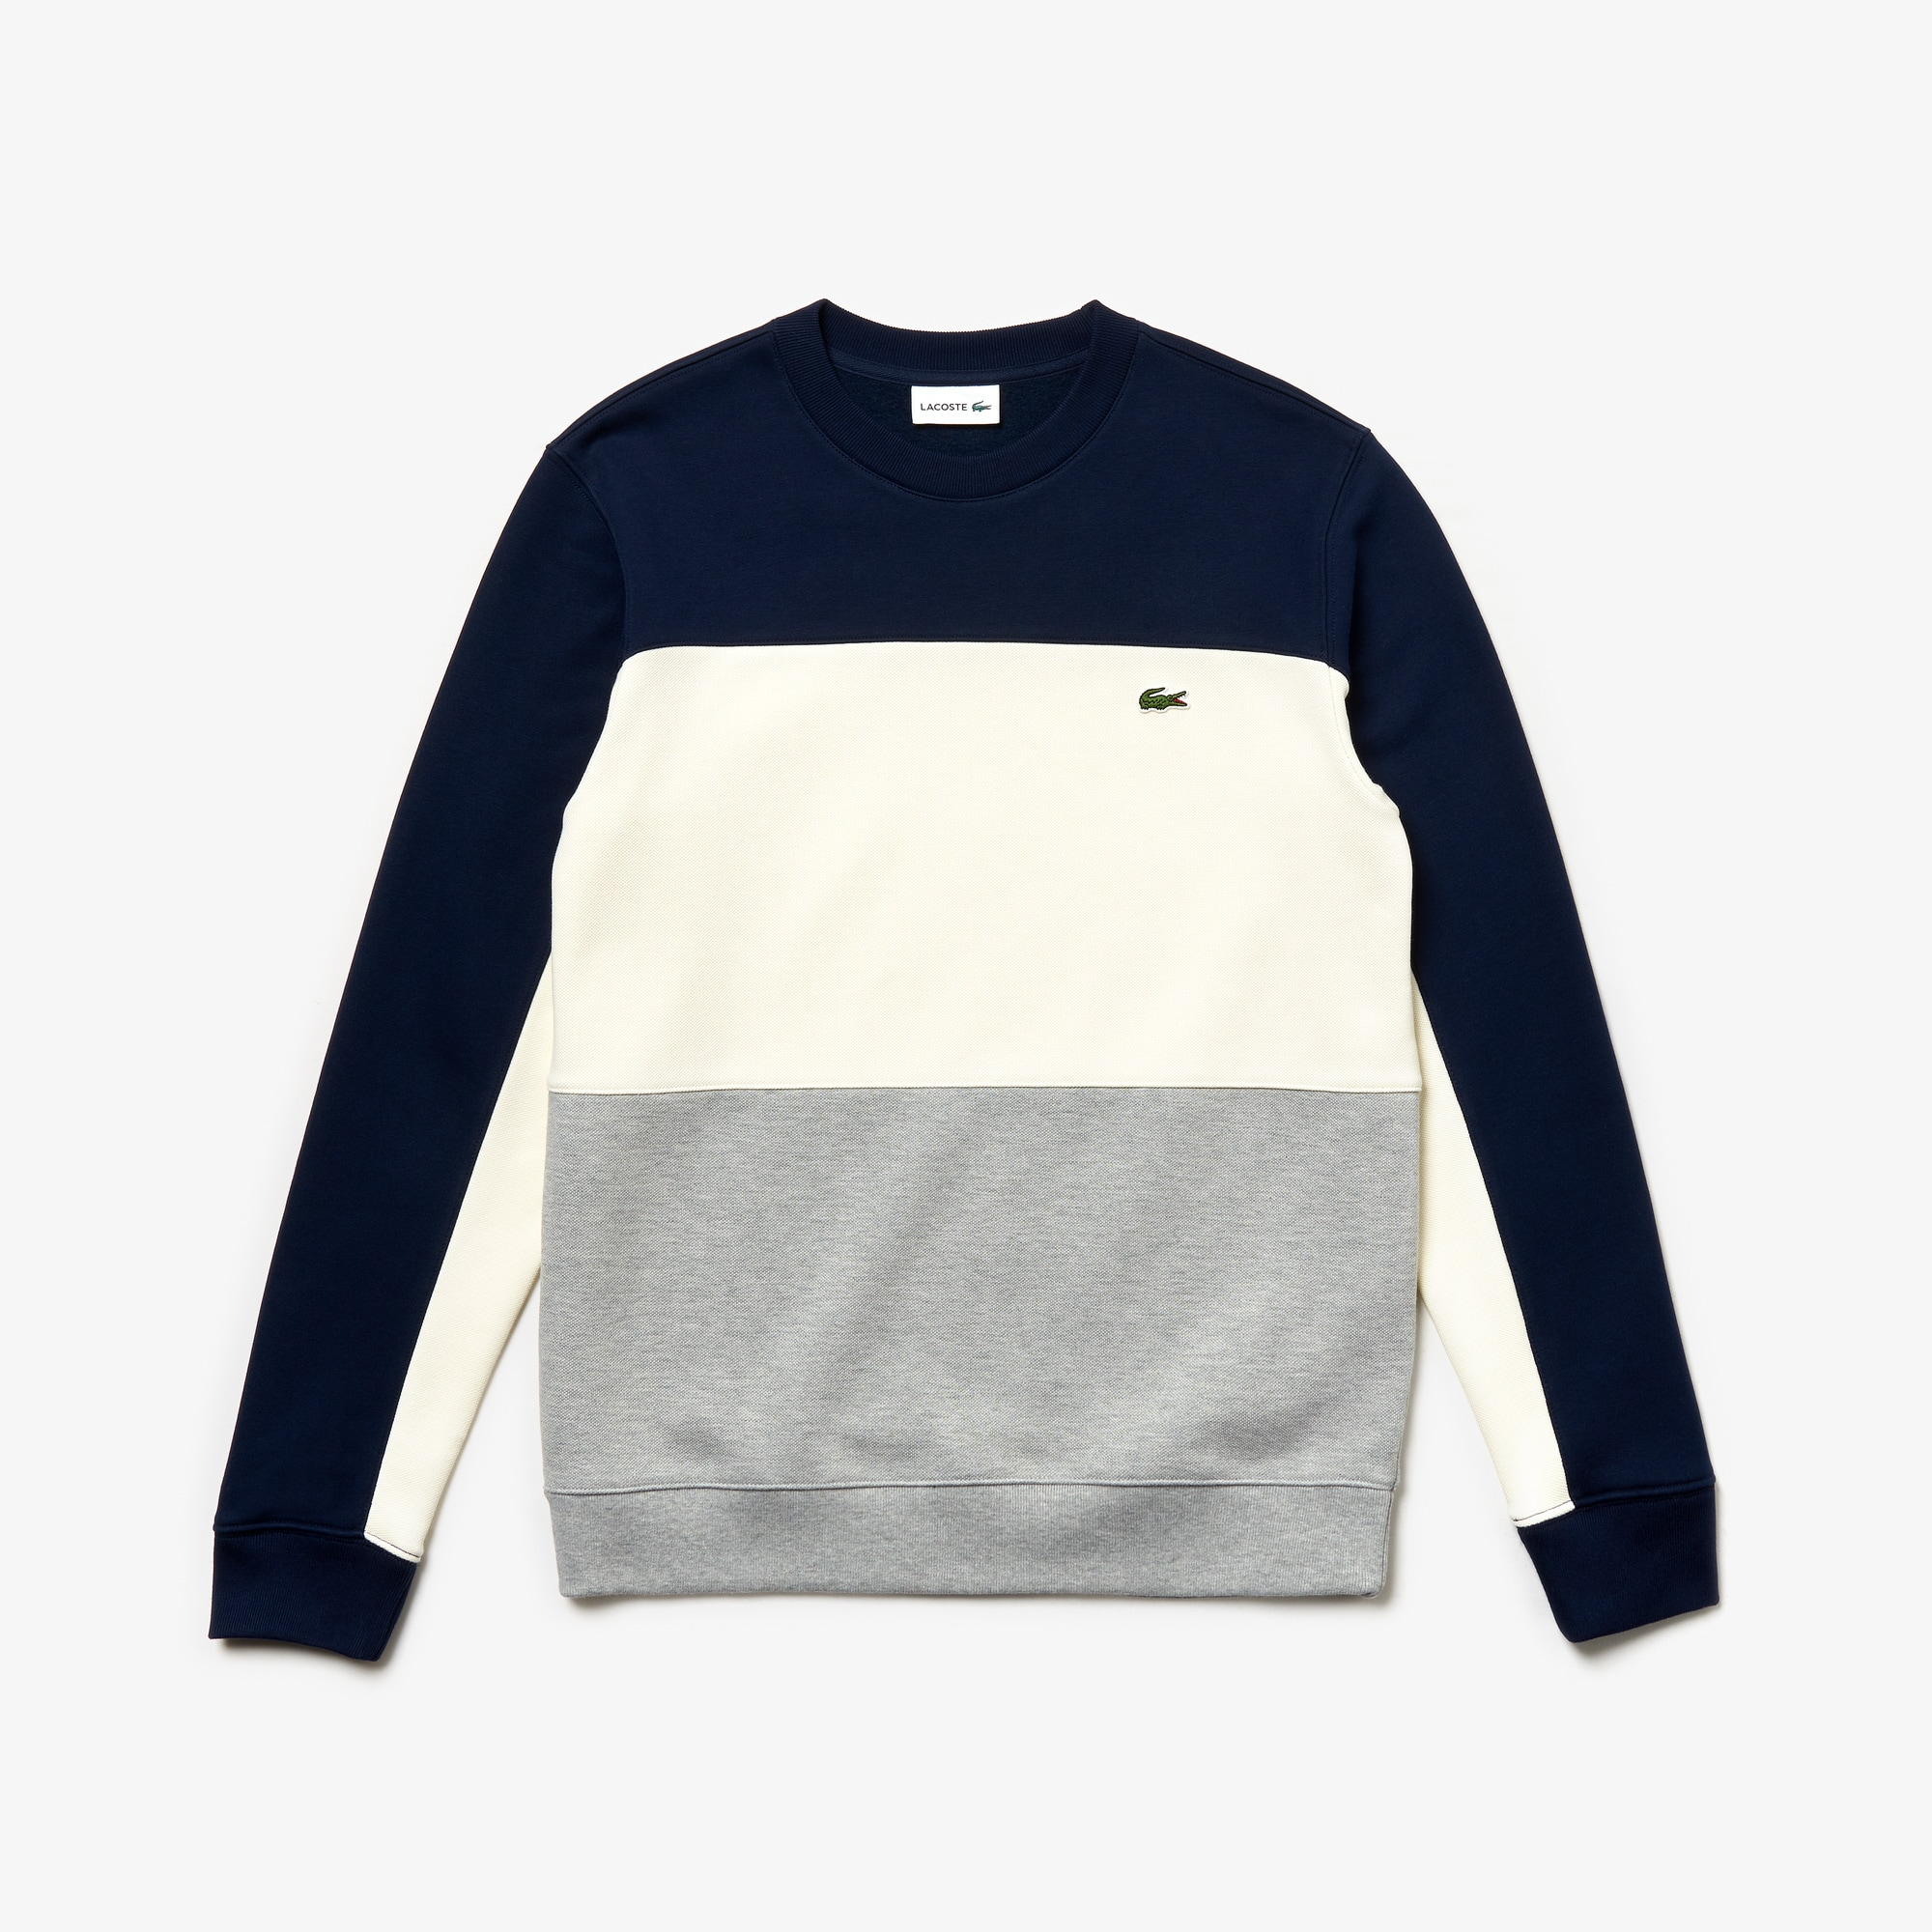 3c8f369cc9 Men's Crew Neck colourblock Piqué Fleece Sweatshirt